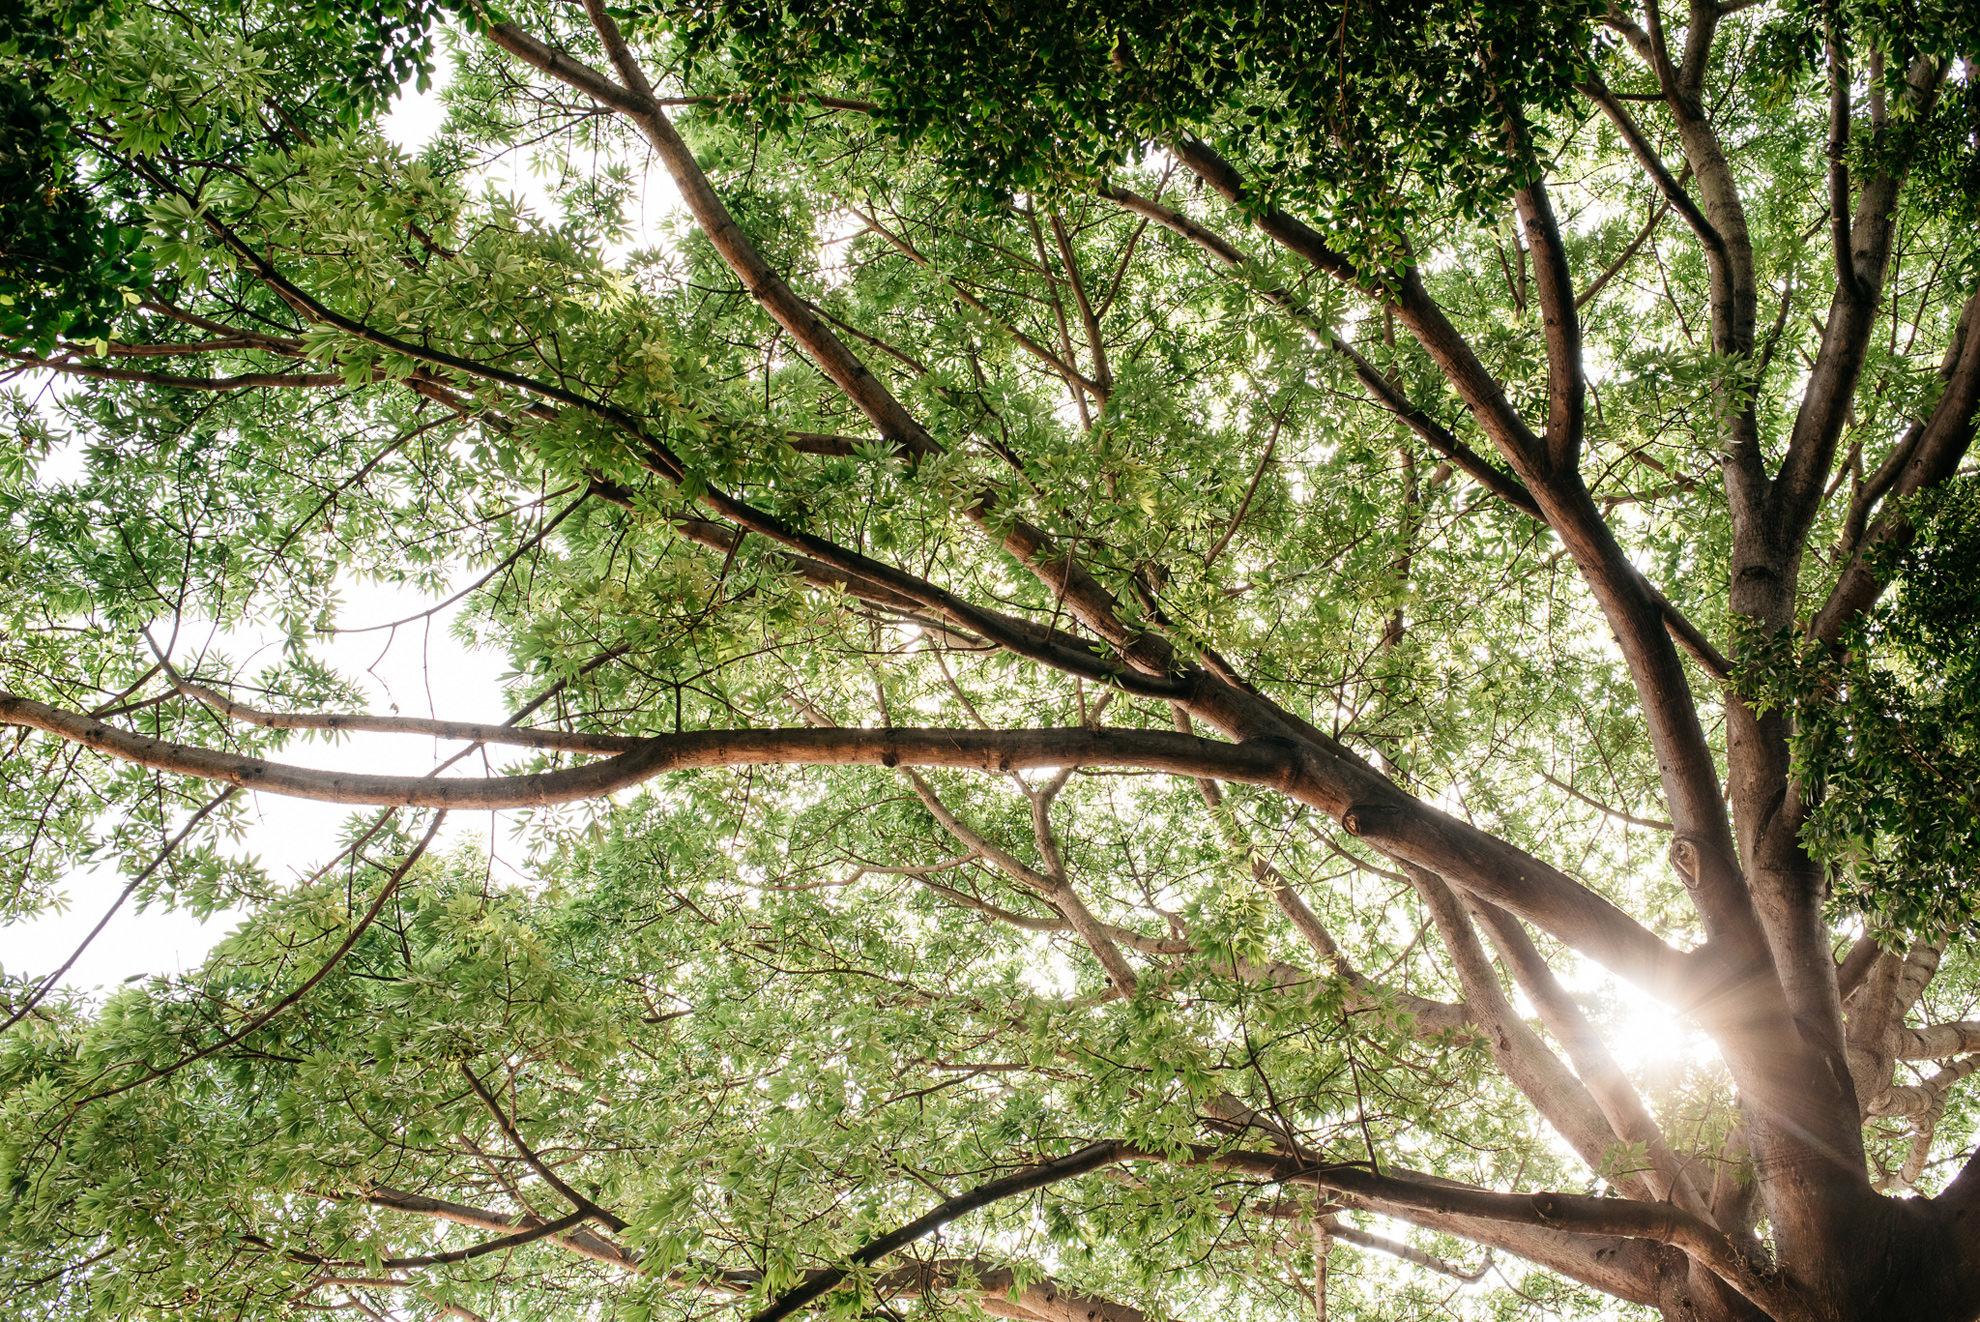 004 - hacienda san carlos.jpg